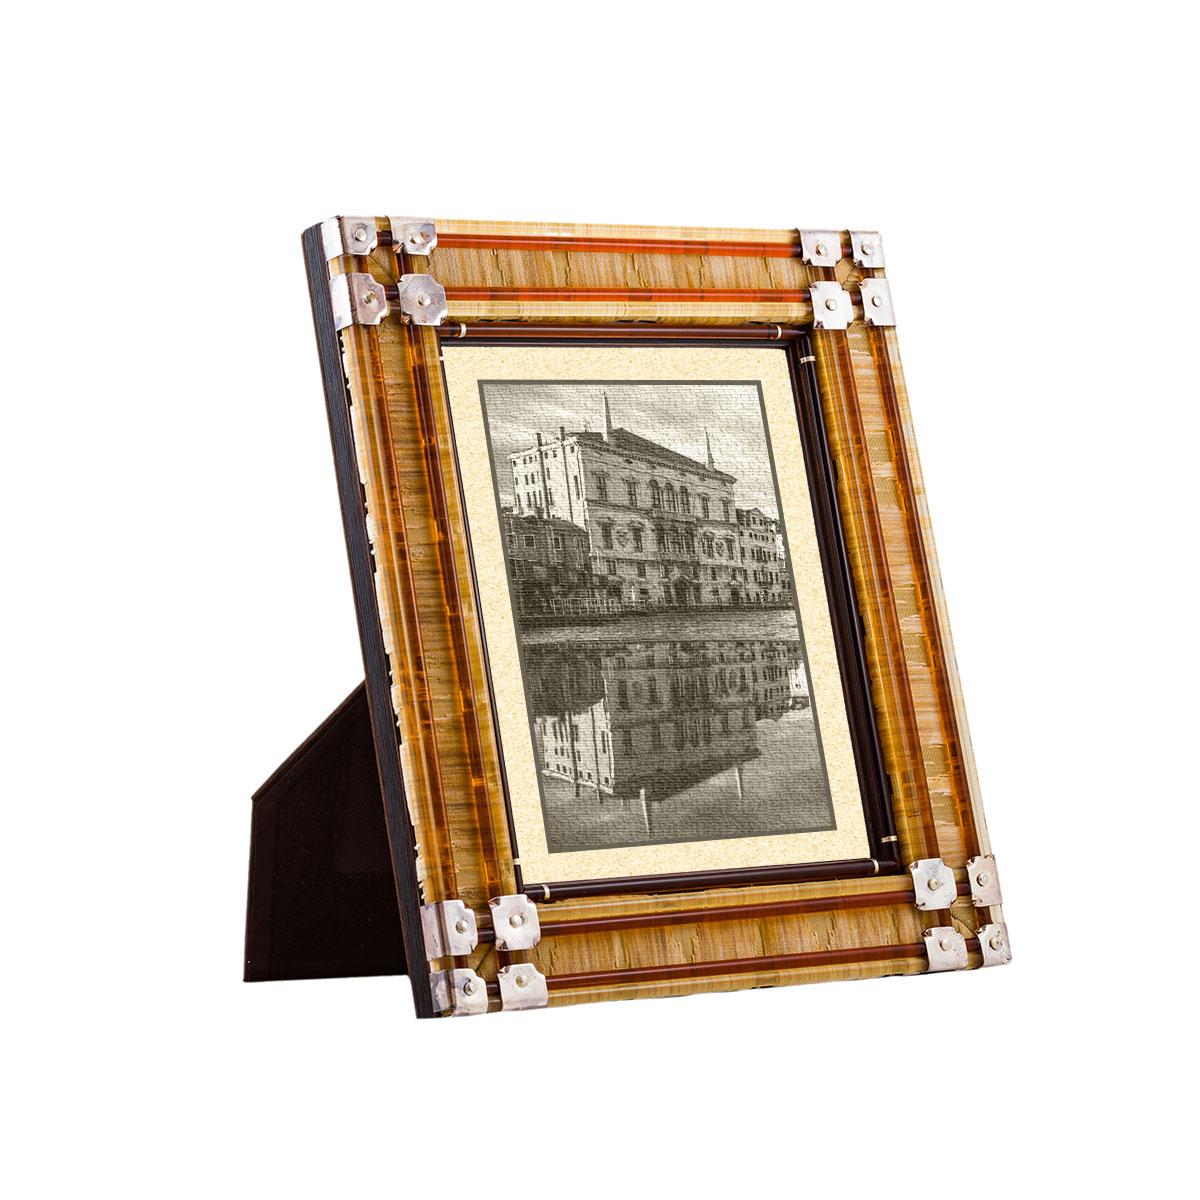 virginia_frame_amber_design_giberto_murano_venice_luxury_photograph